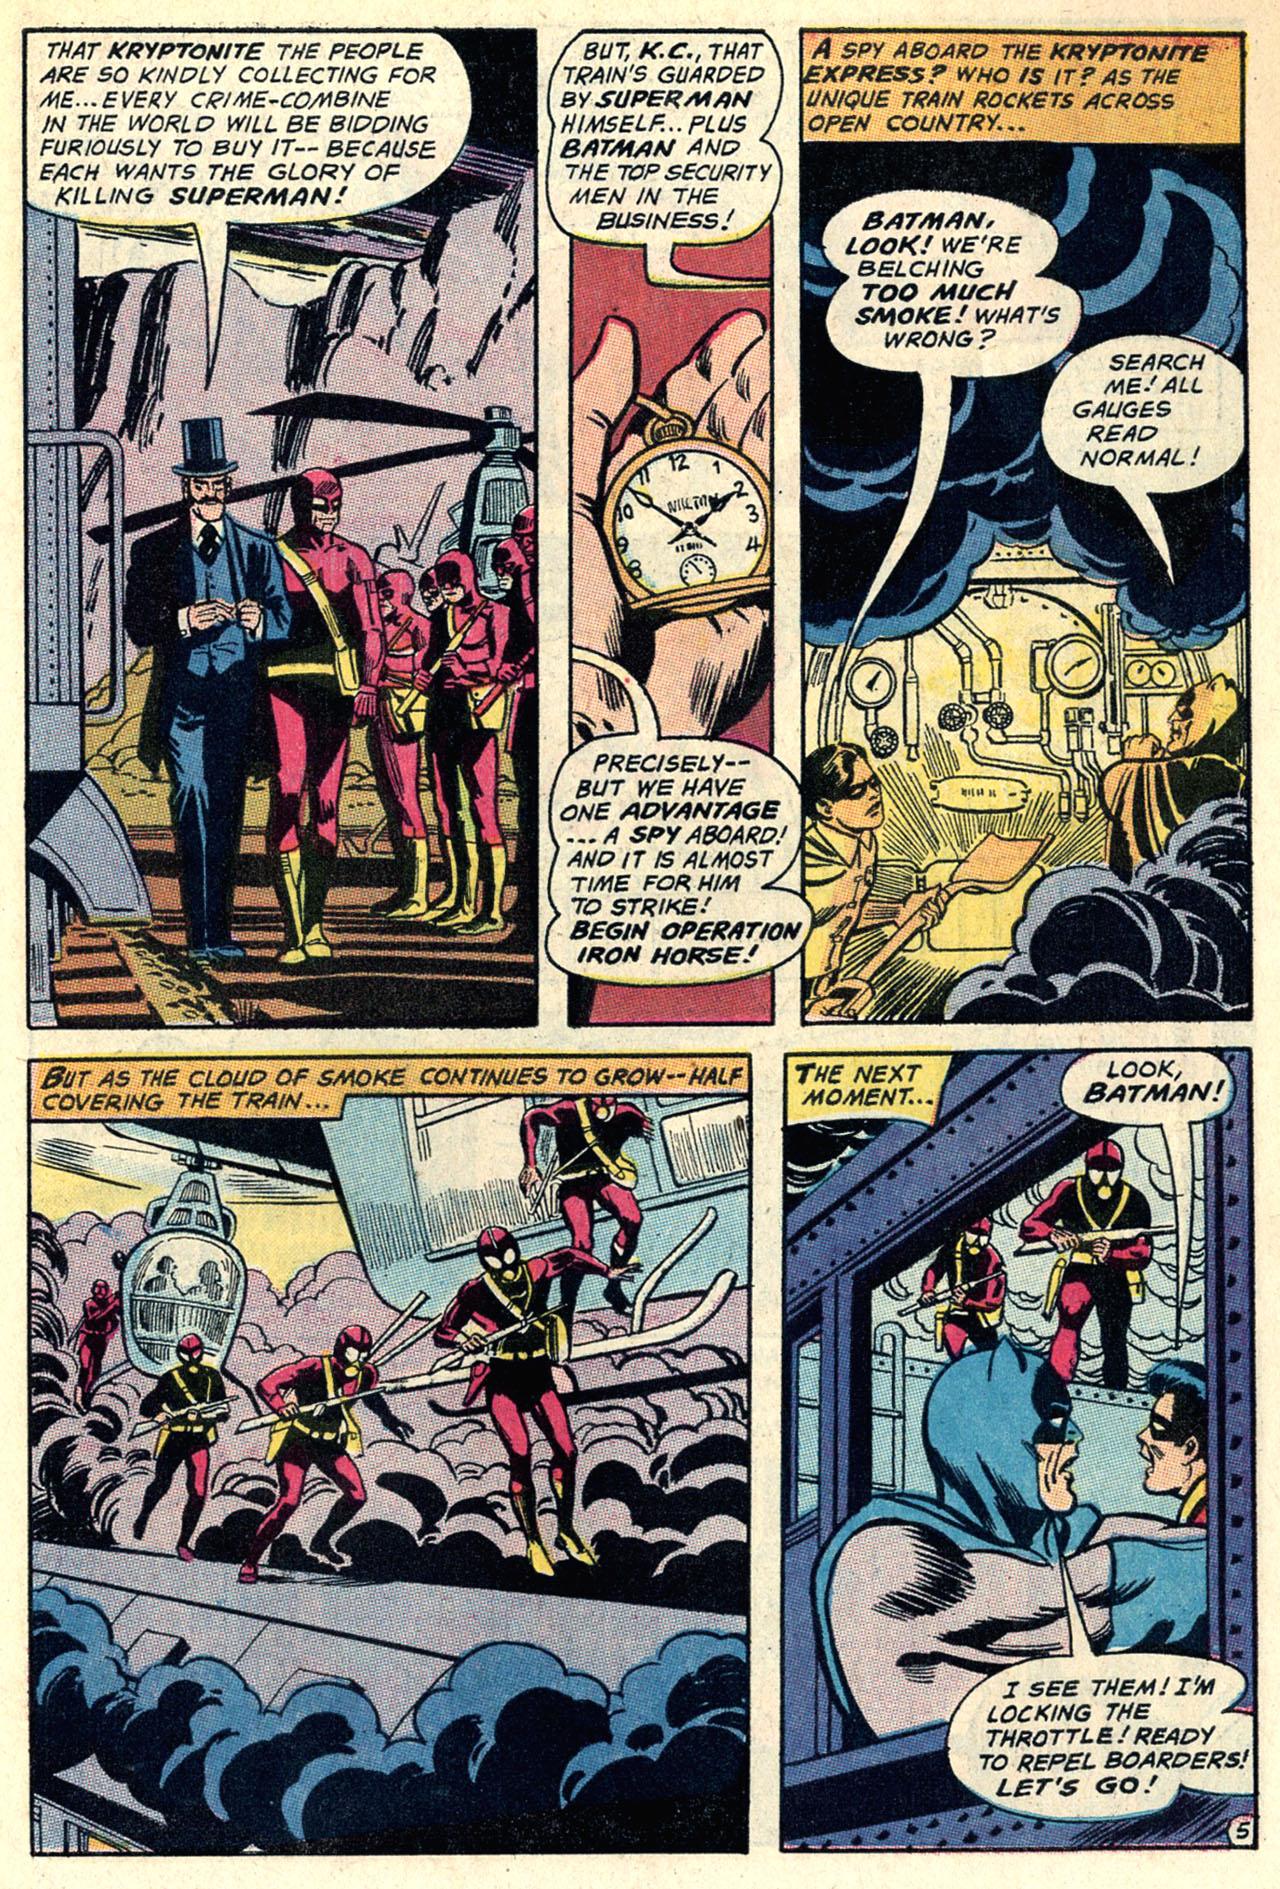 Read online World's Finest Comics comic -  Issue #196 - 7